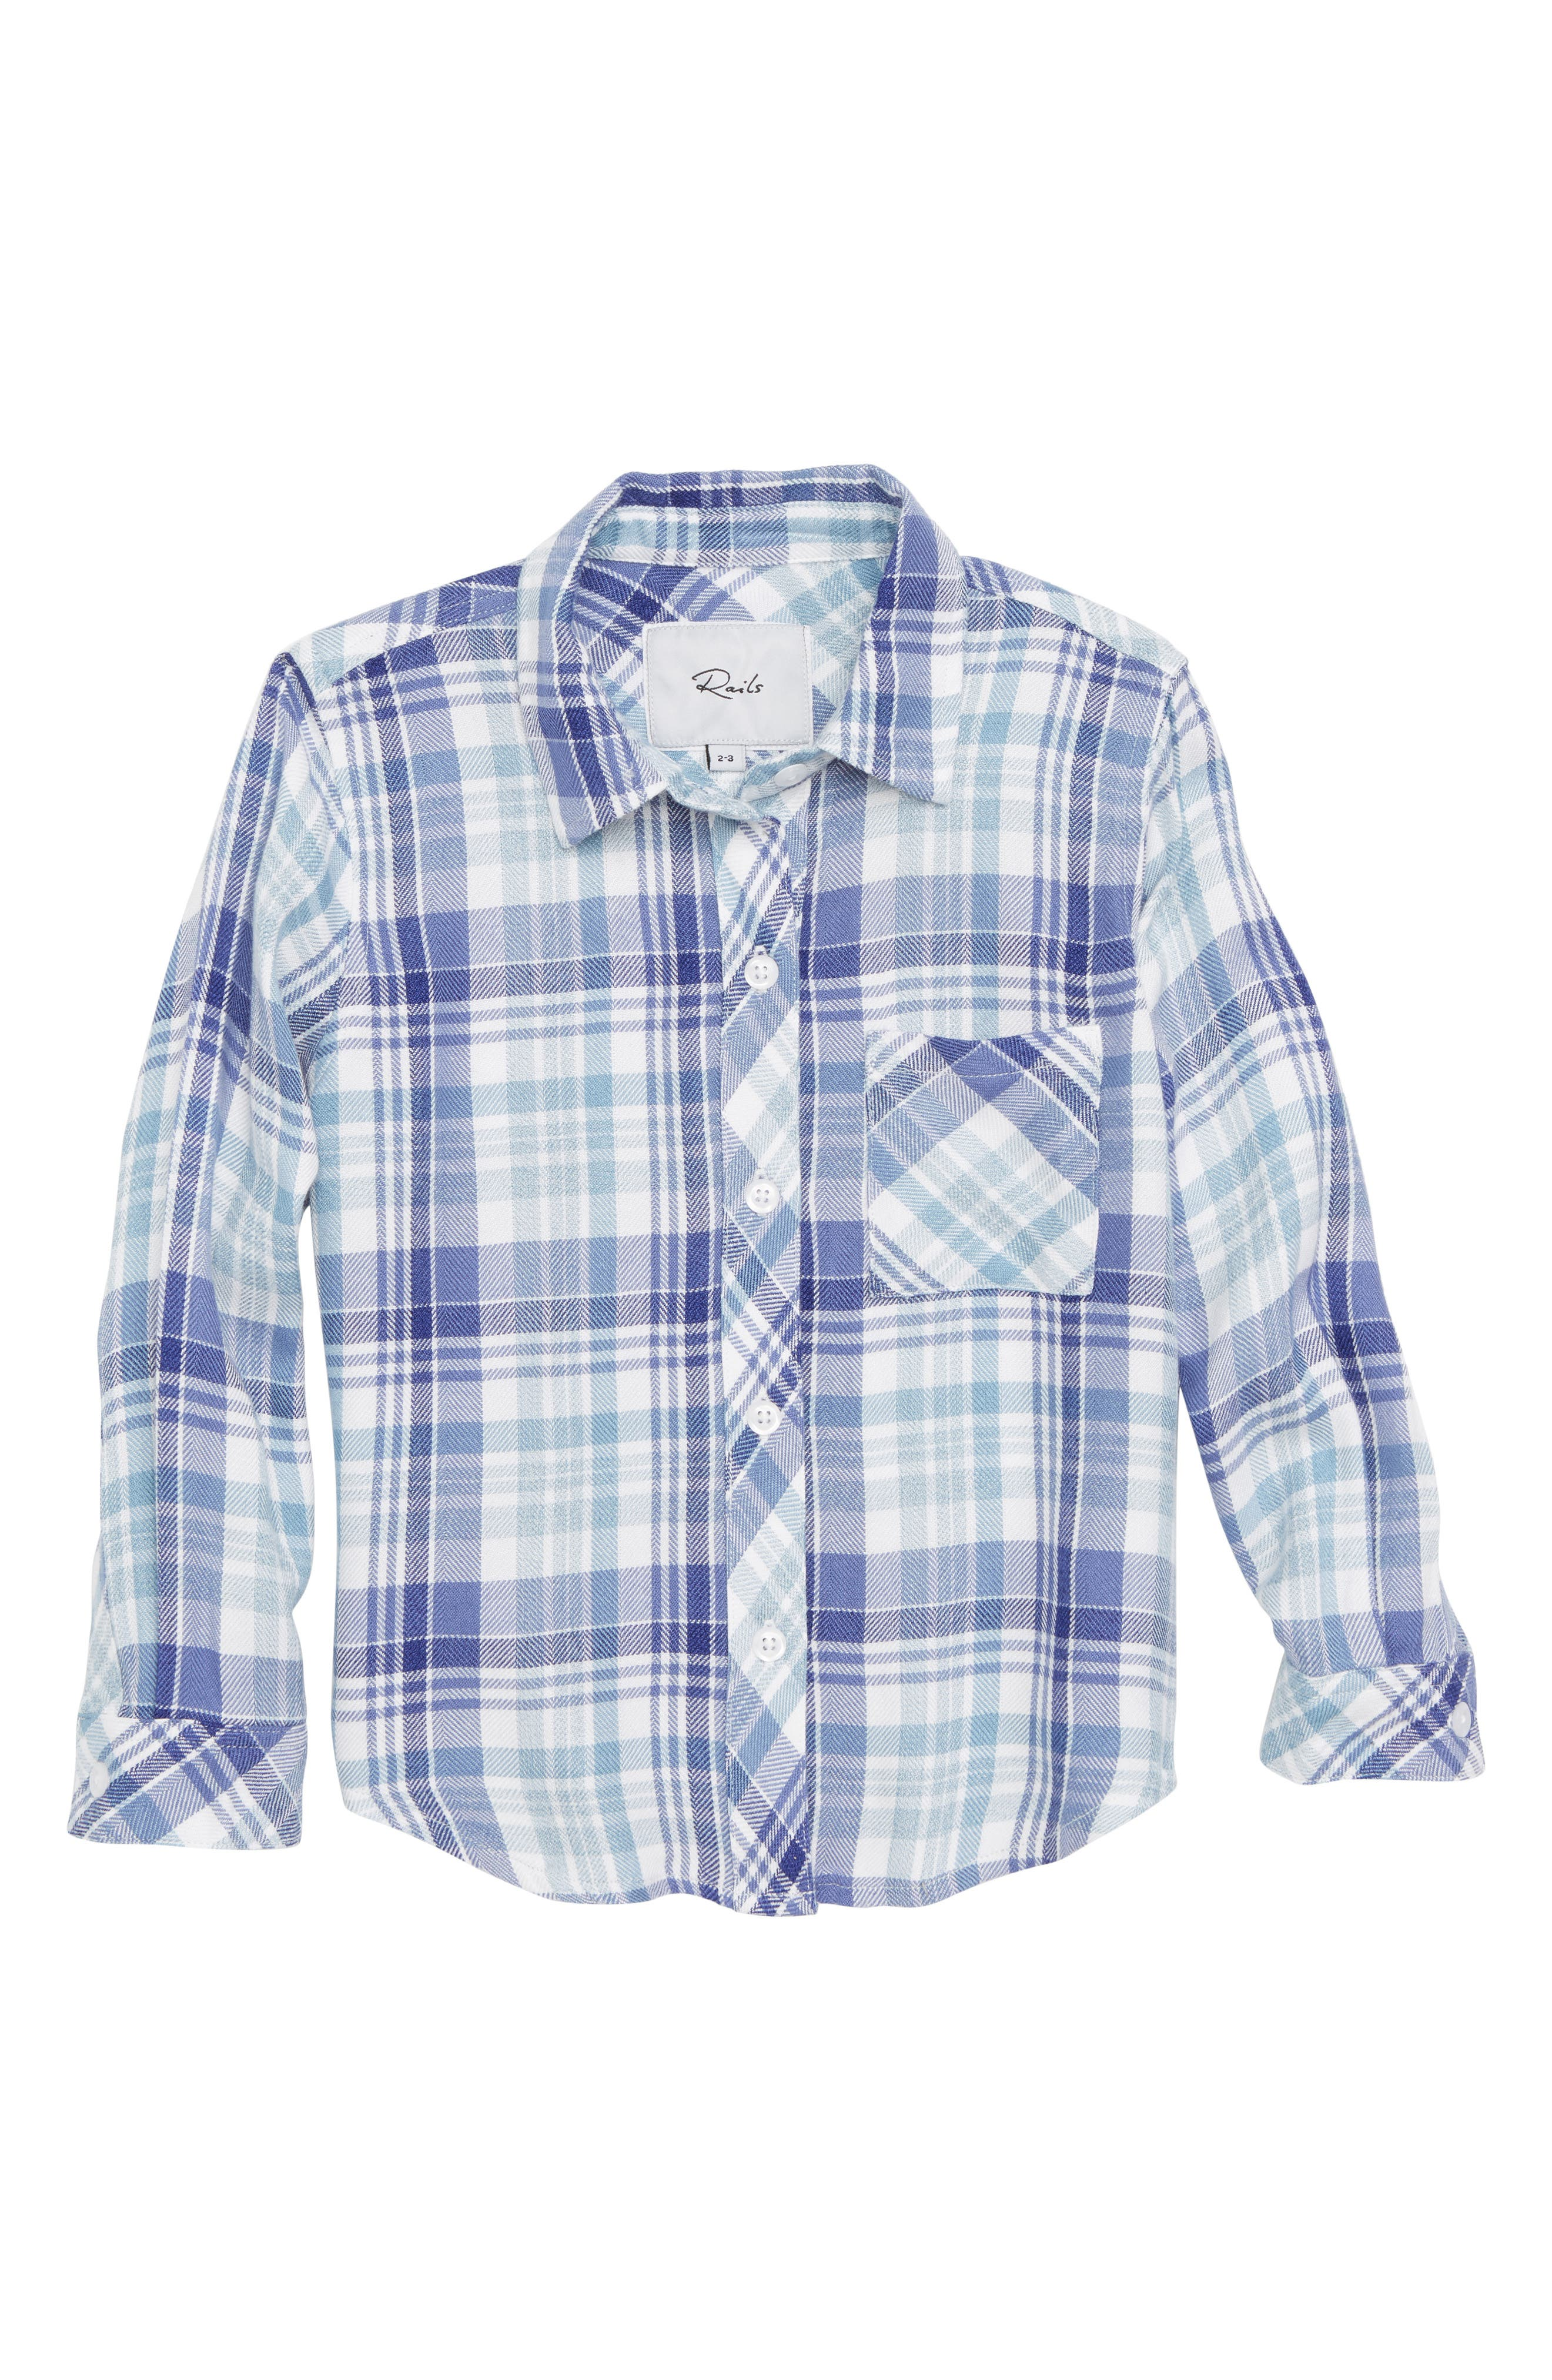 Hudson Plaid Shirt,                             Main thumbnail 1, color,                             401